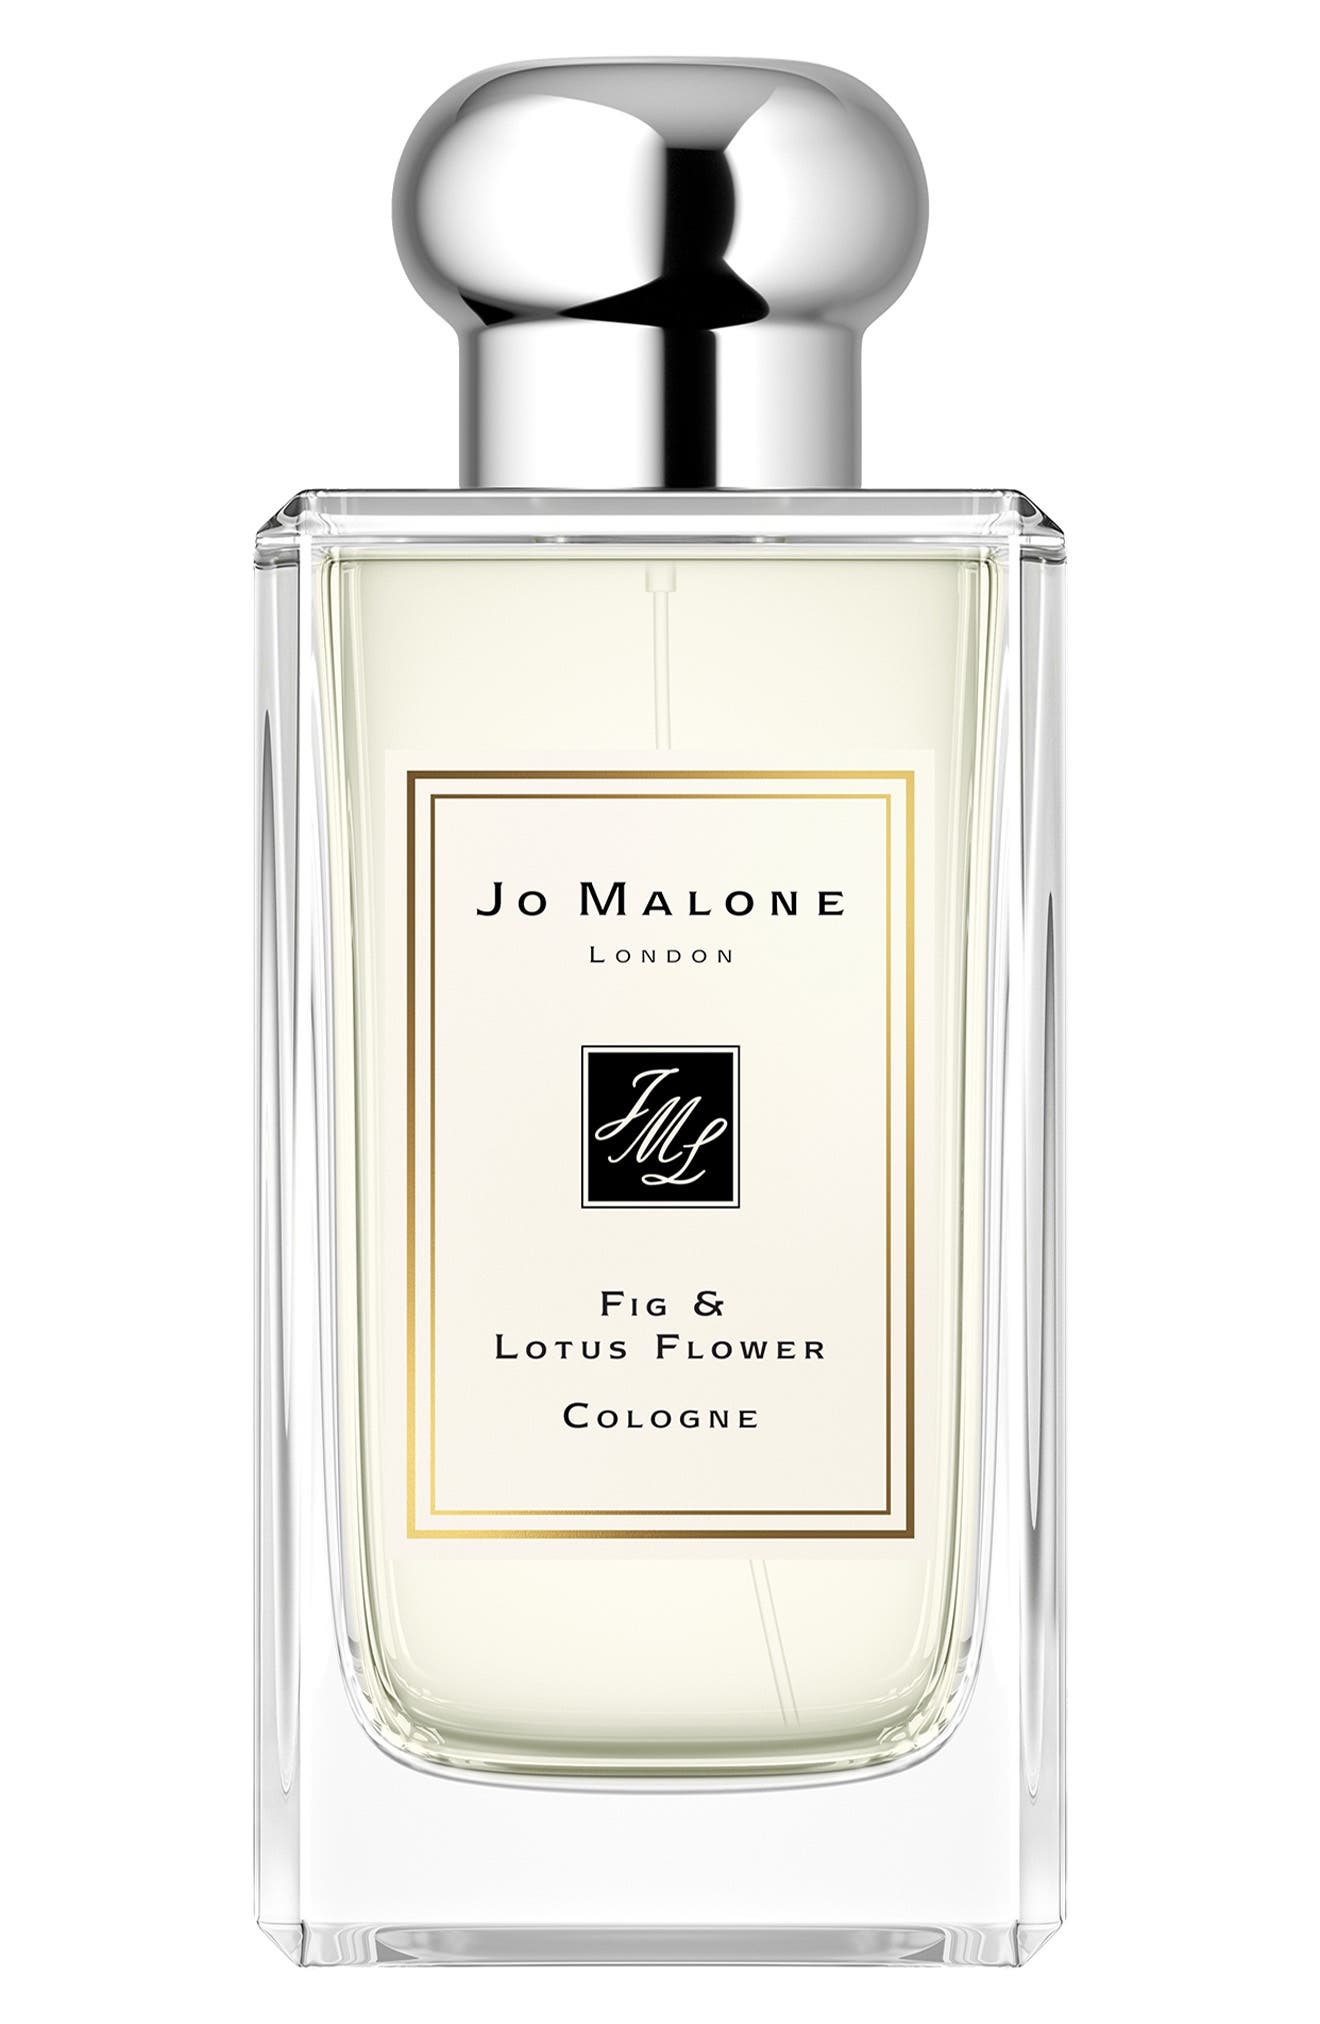 Jo Malone London(TM) Fig & Lotus Flower Cologne